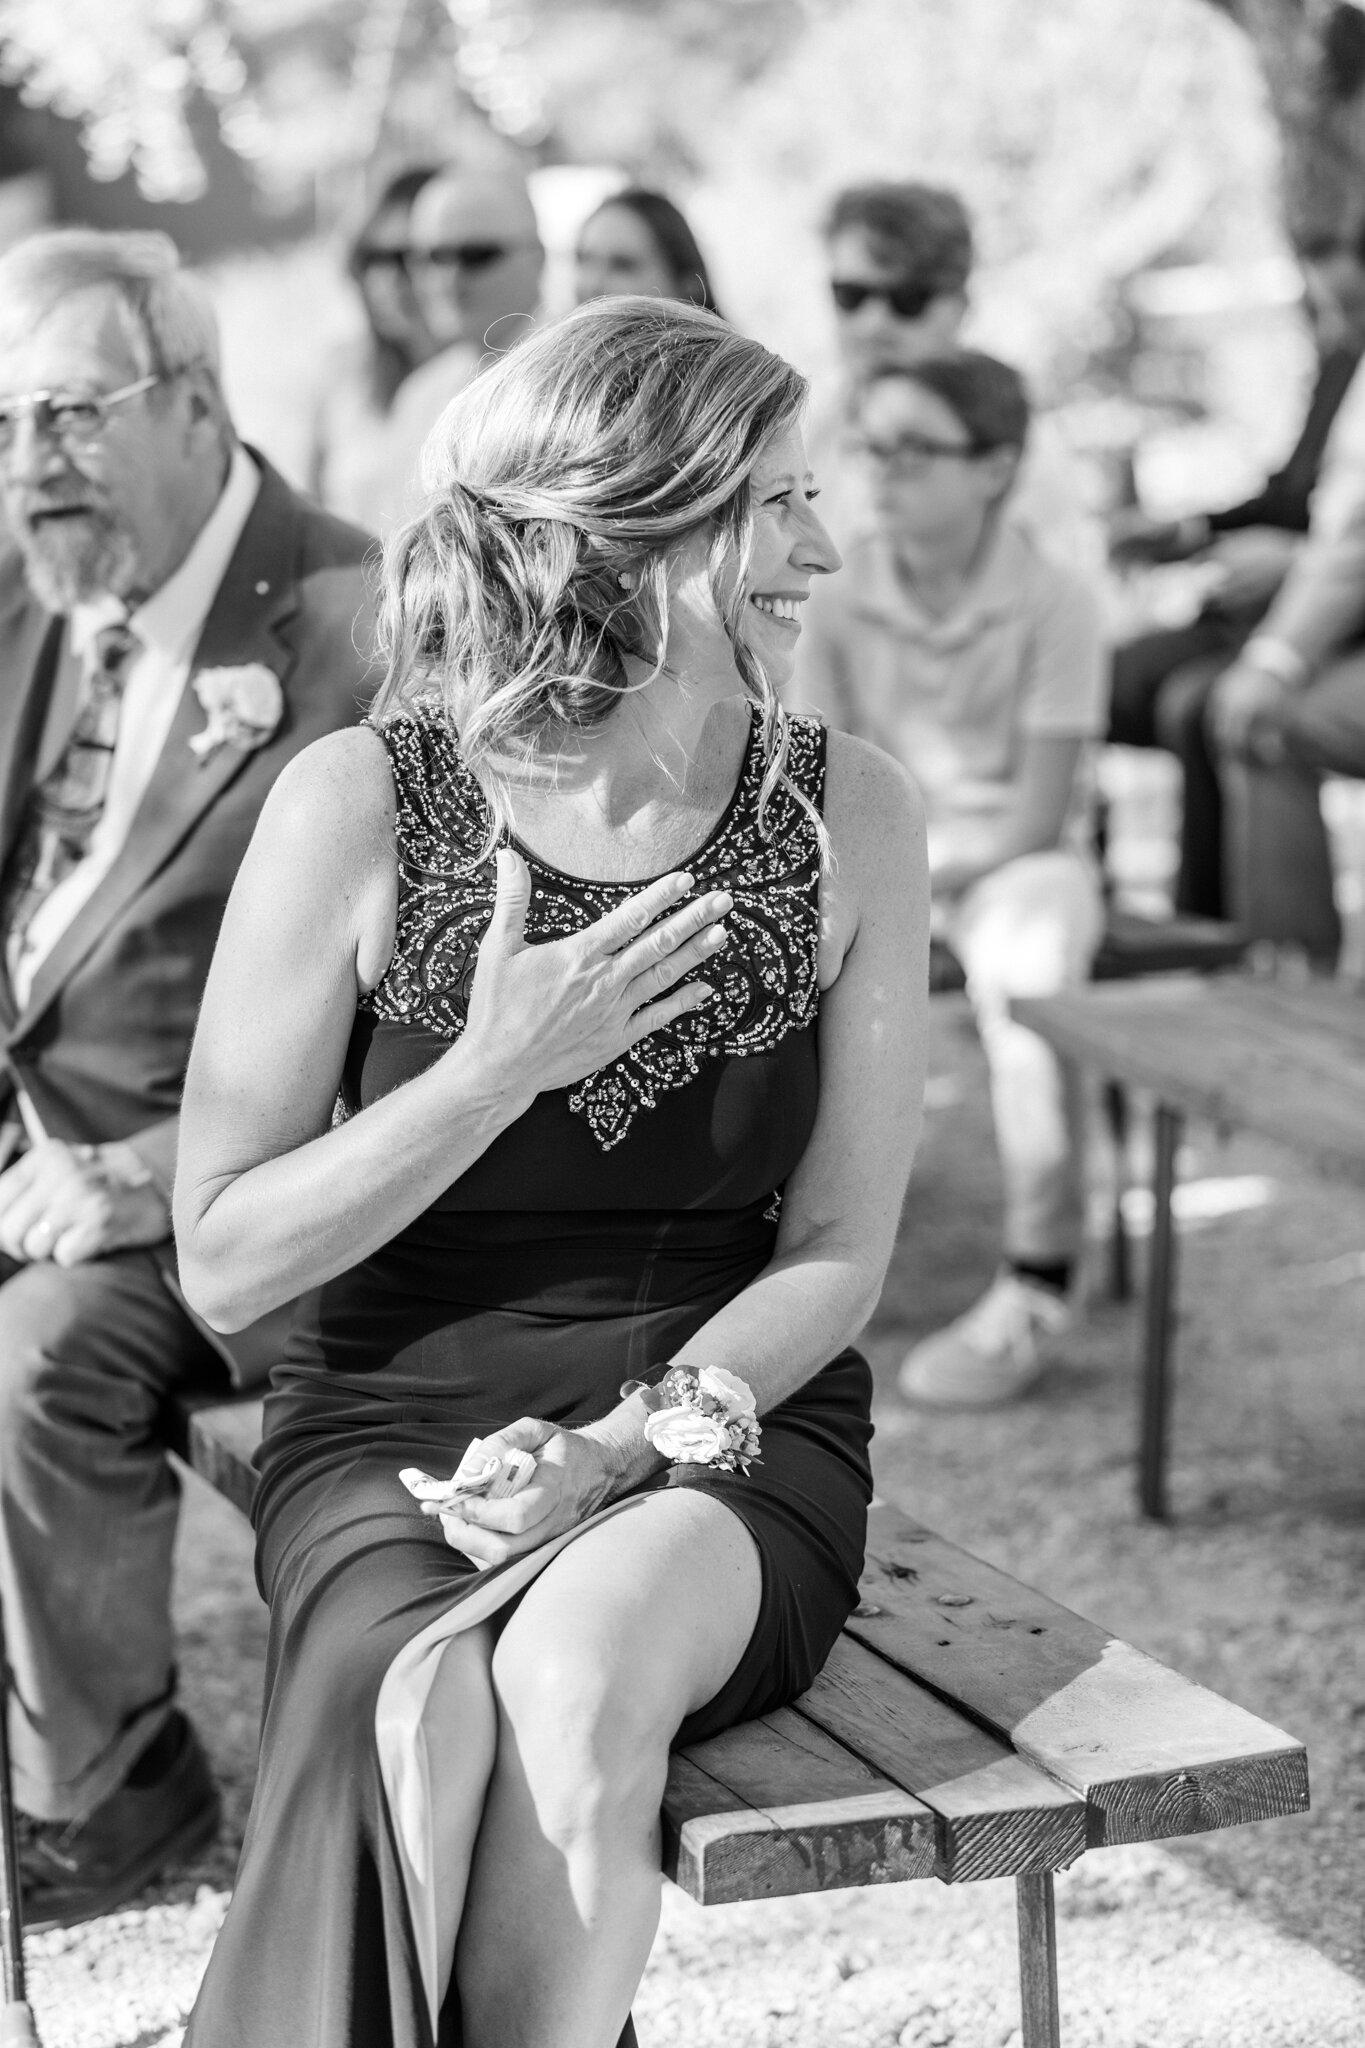 San Antonio Austin Boerne New Braunfels Spring Branch Texas Wedding Engagement Photographer Photography Hill Country Texas Park 31 Wedding Summer Wedding Pink Navy Gold Elegant Chic Wedding San Antonio Austin Texas photographer 45